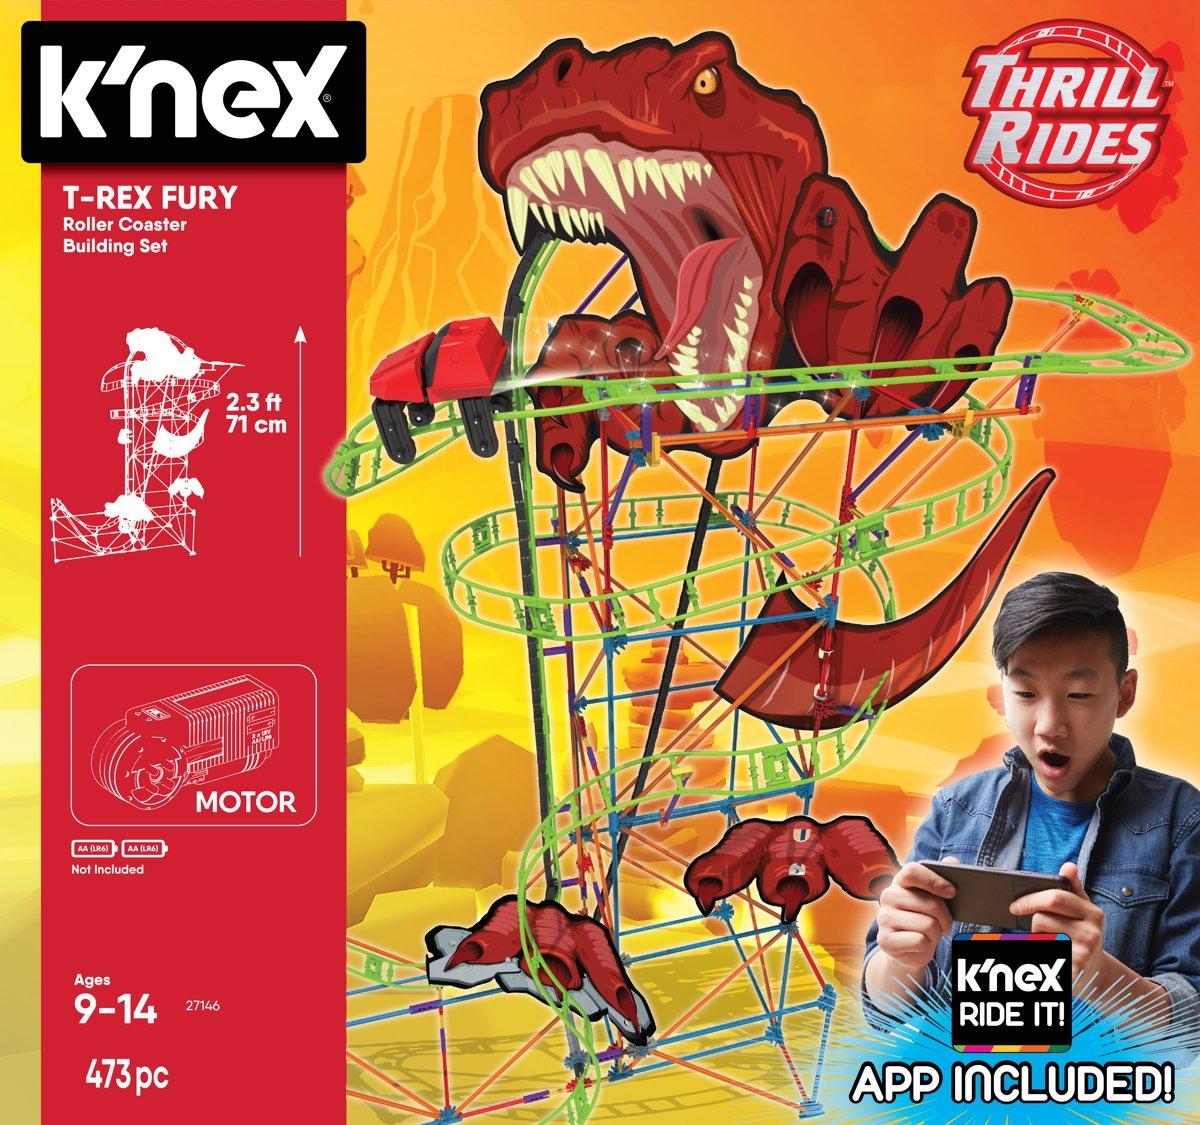 K'nex Thrill Rides Dino T-Rex Fury Achtbaan voor €19,99 @ Bol.com